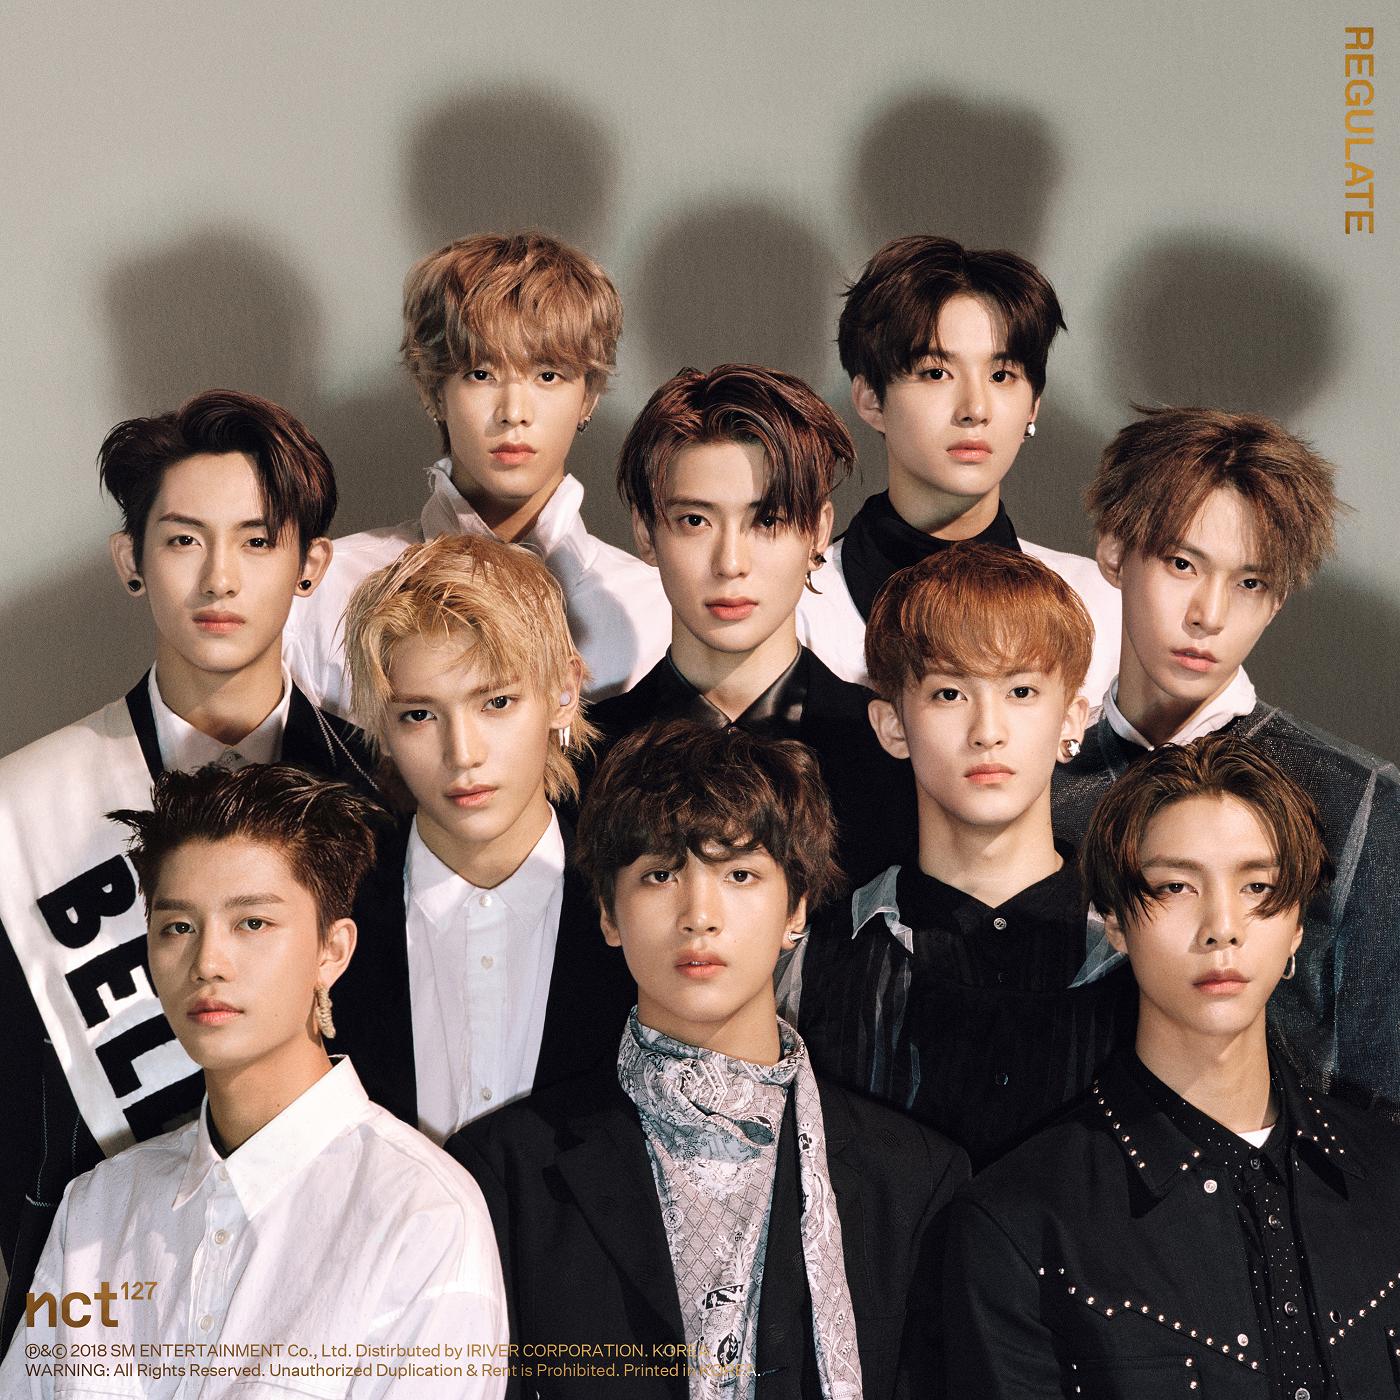 NCT_127_Regulate_digital_album_cover